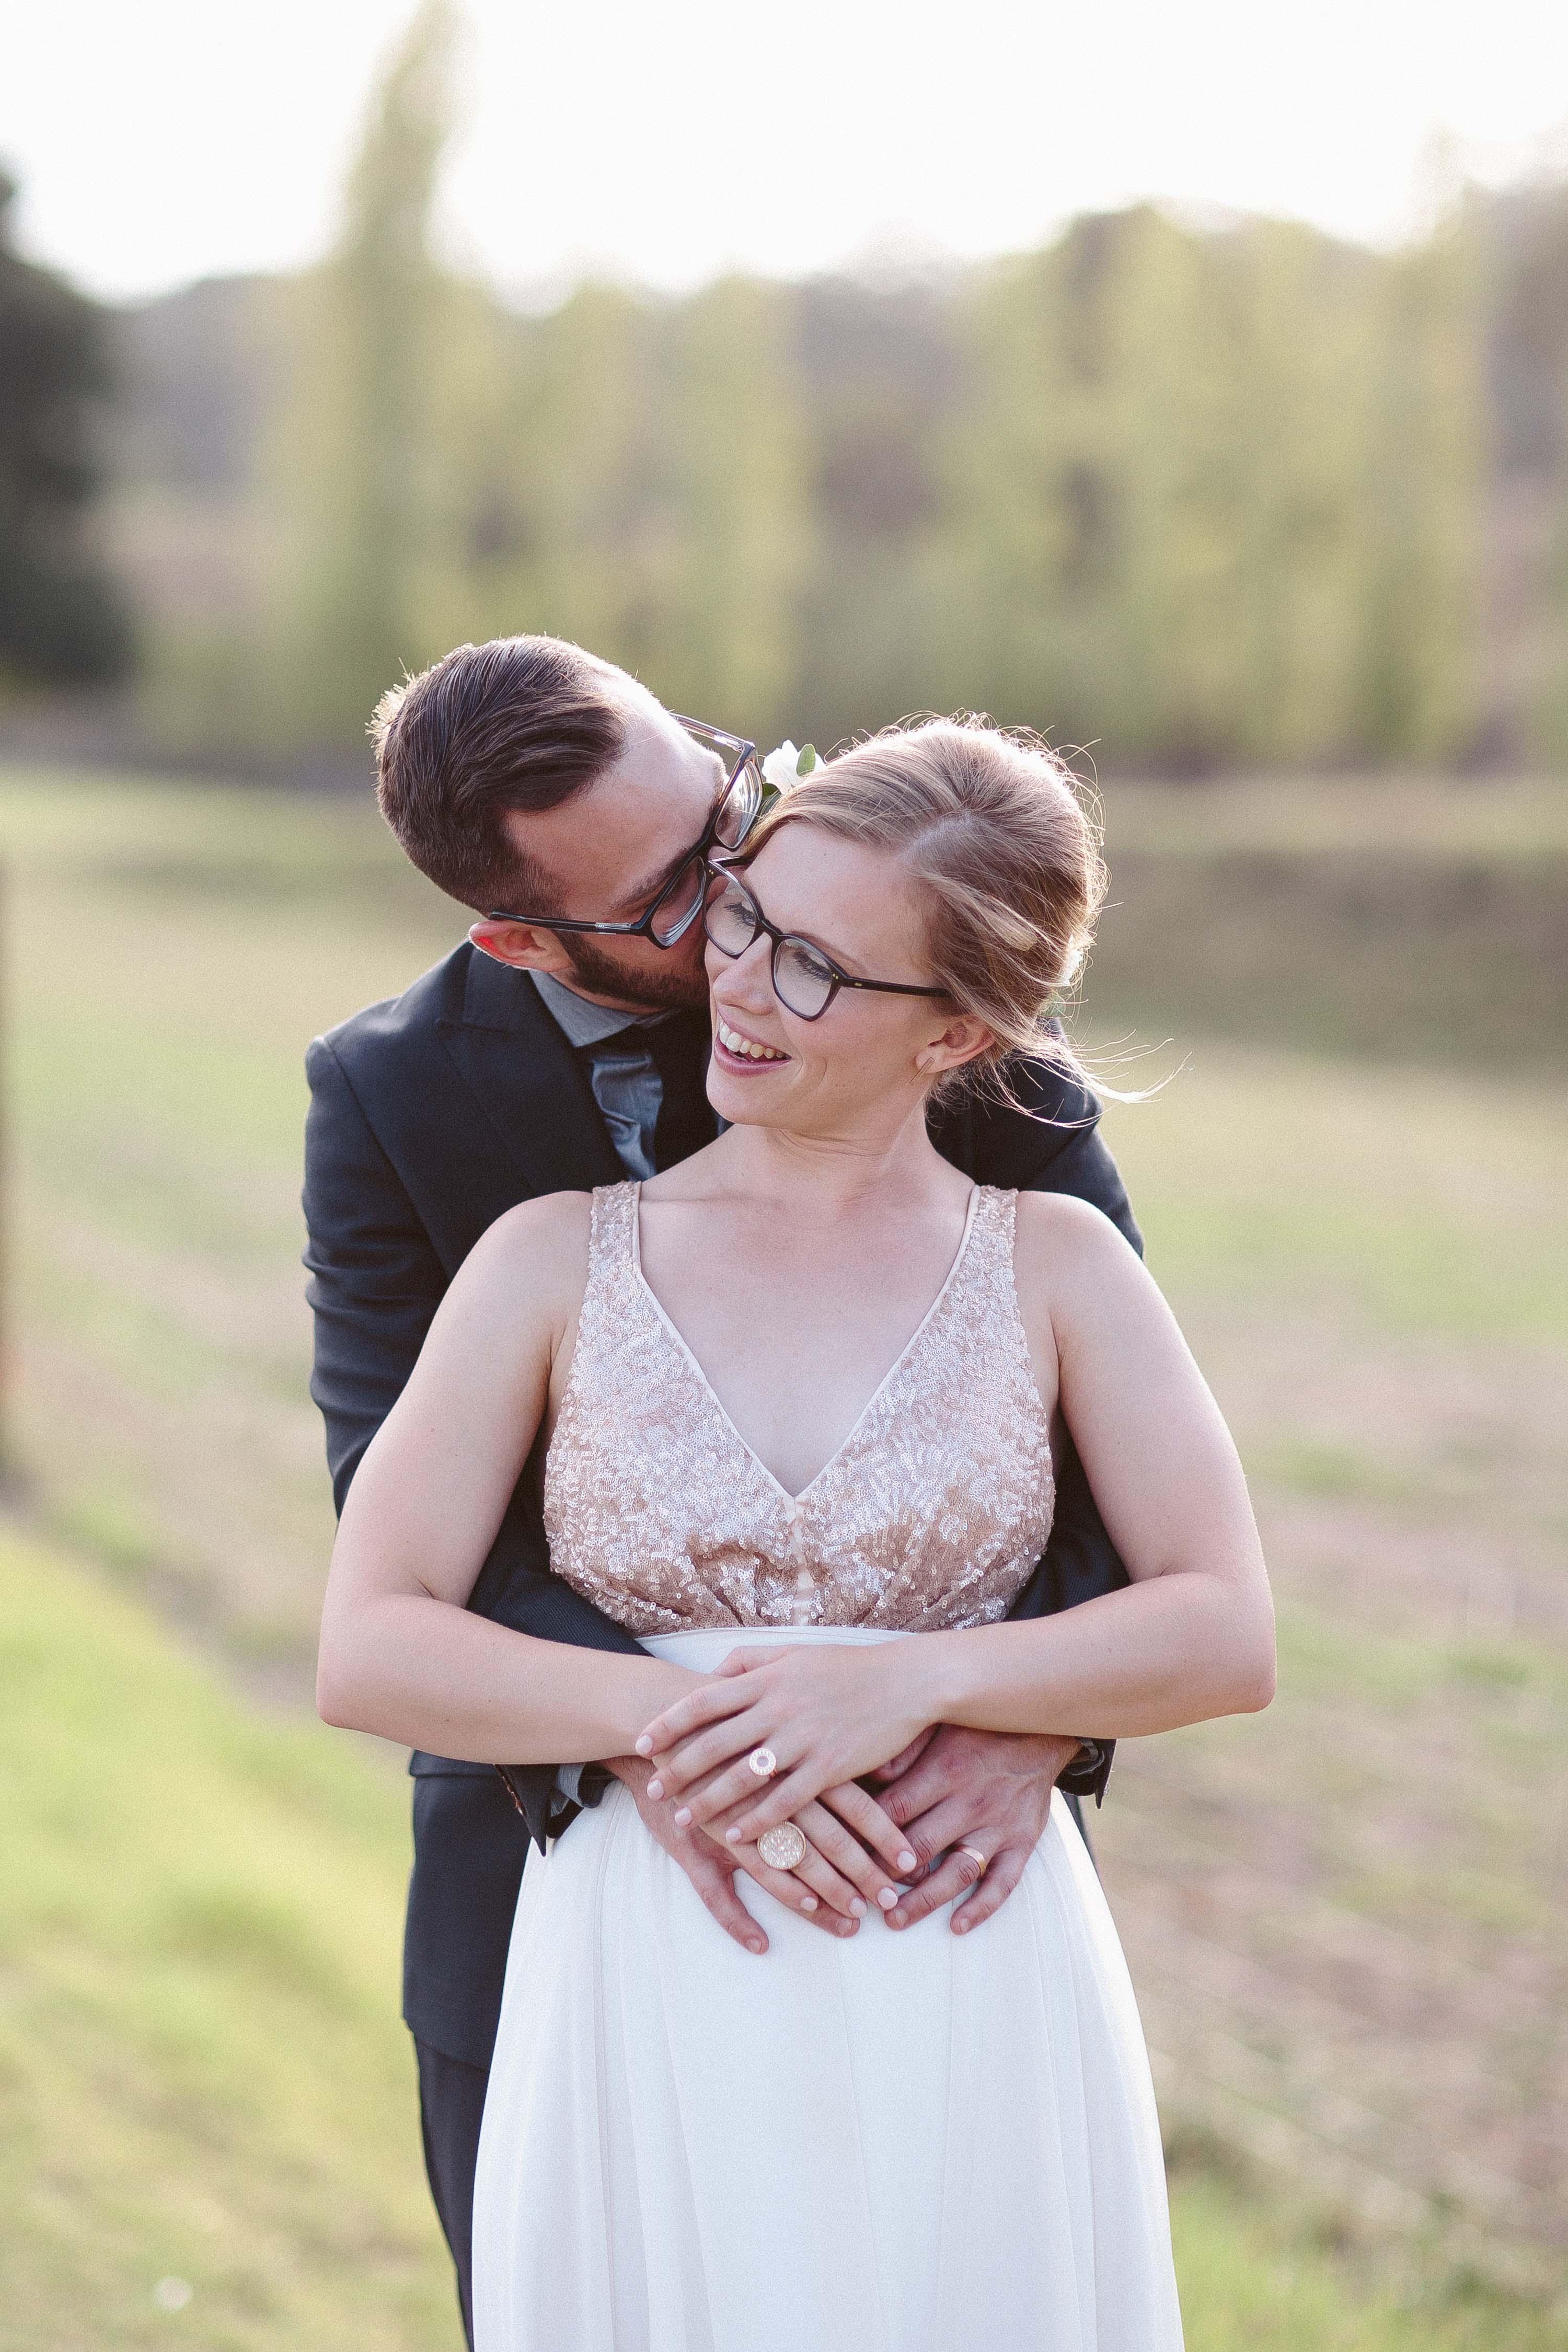 elise&liam-wedding-sonjacphotography-highres-843